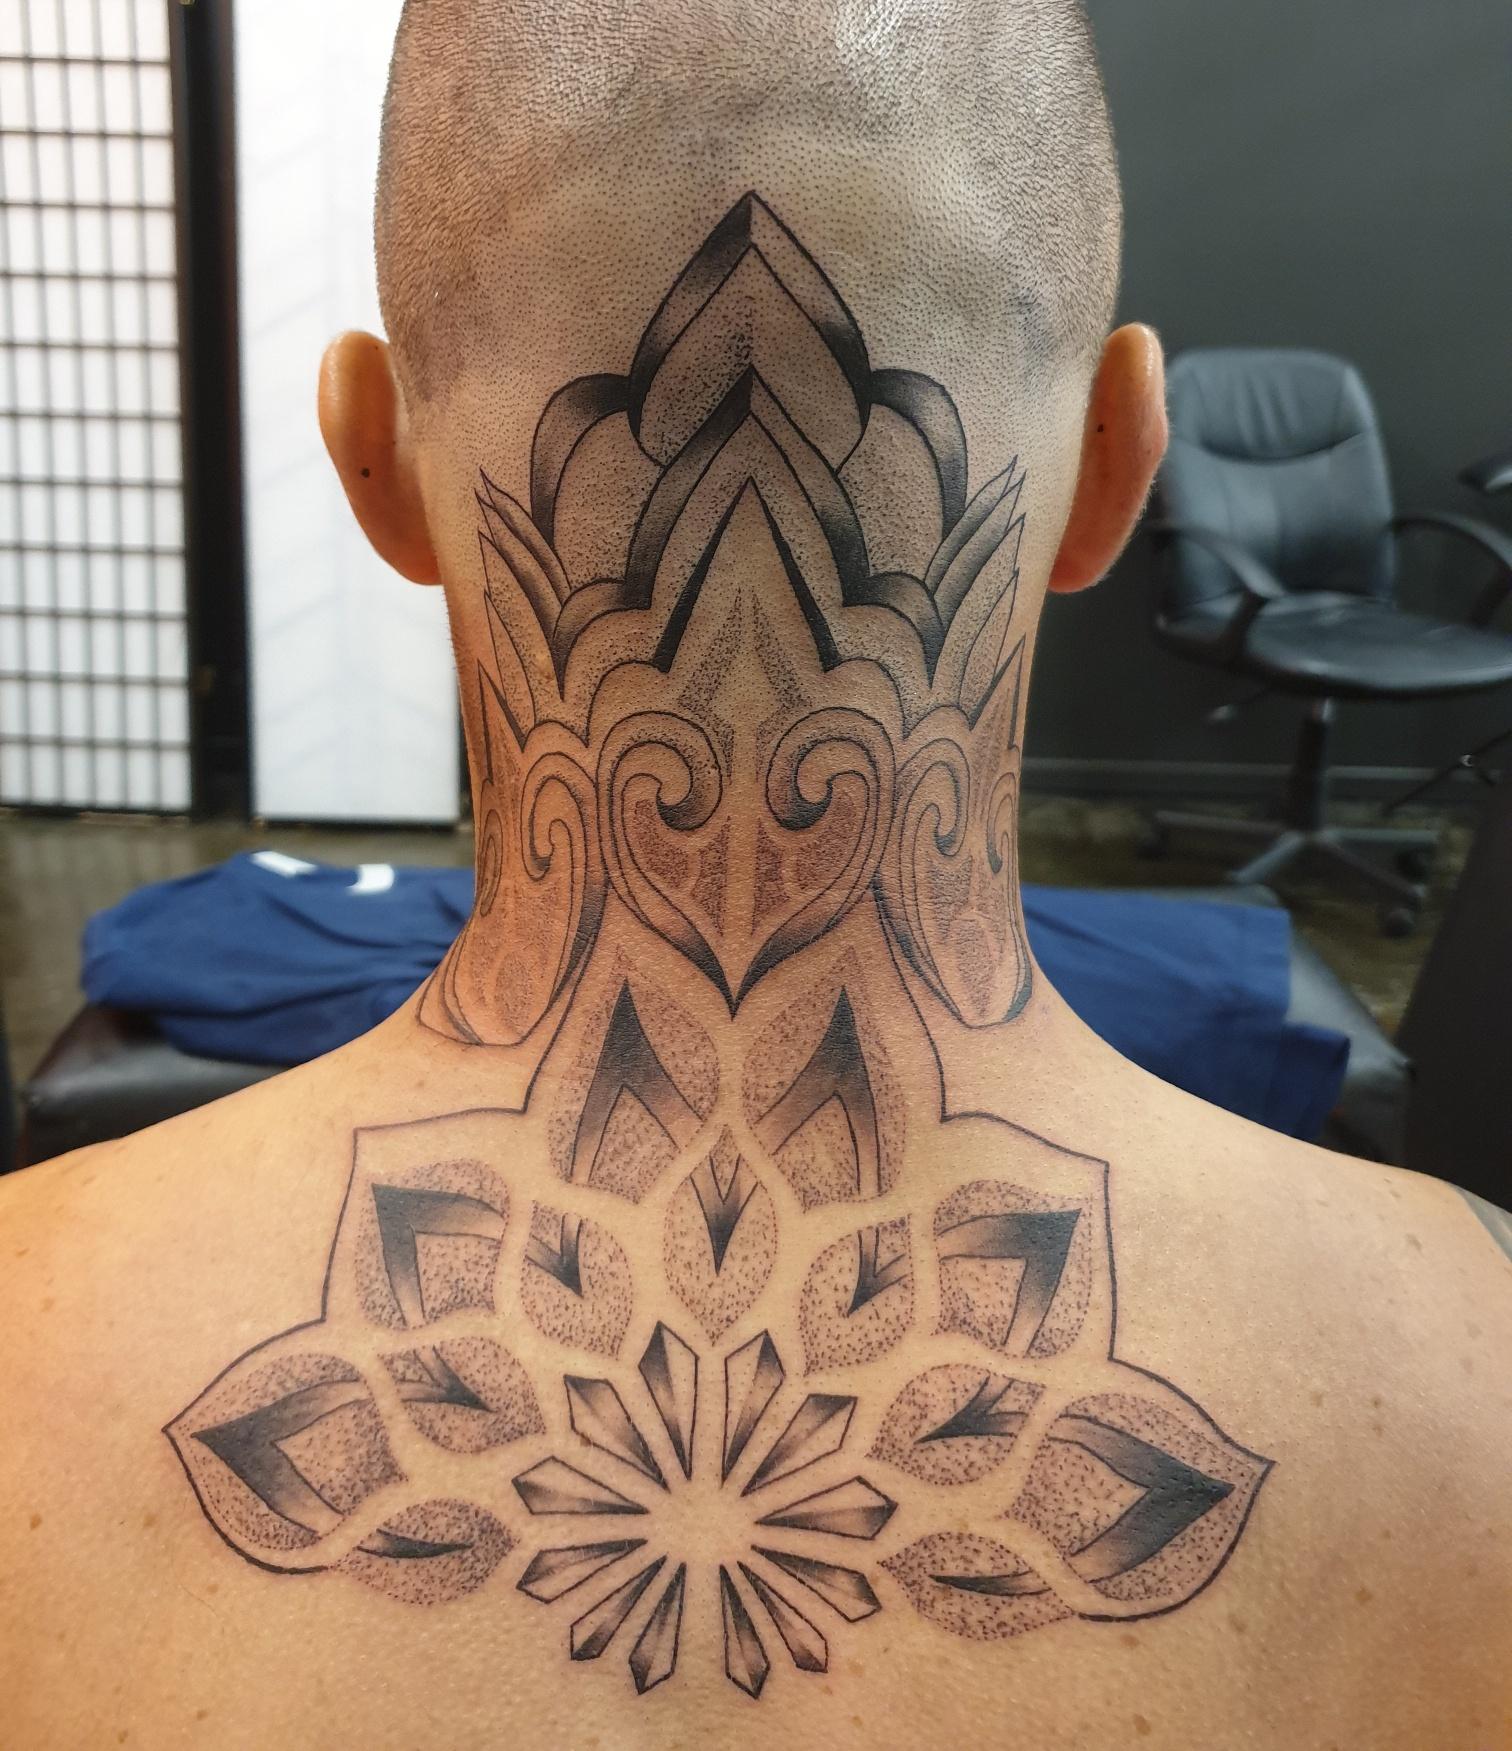 Tattoo Artists in Launceston